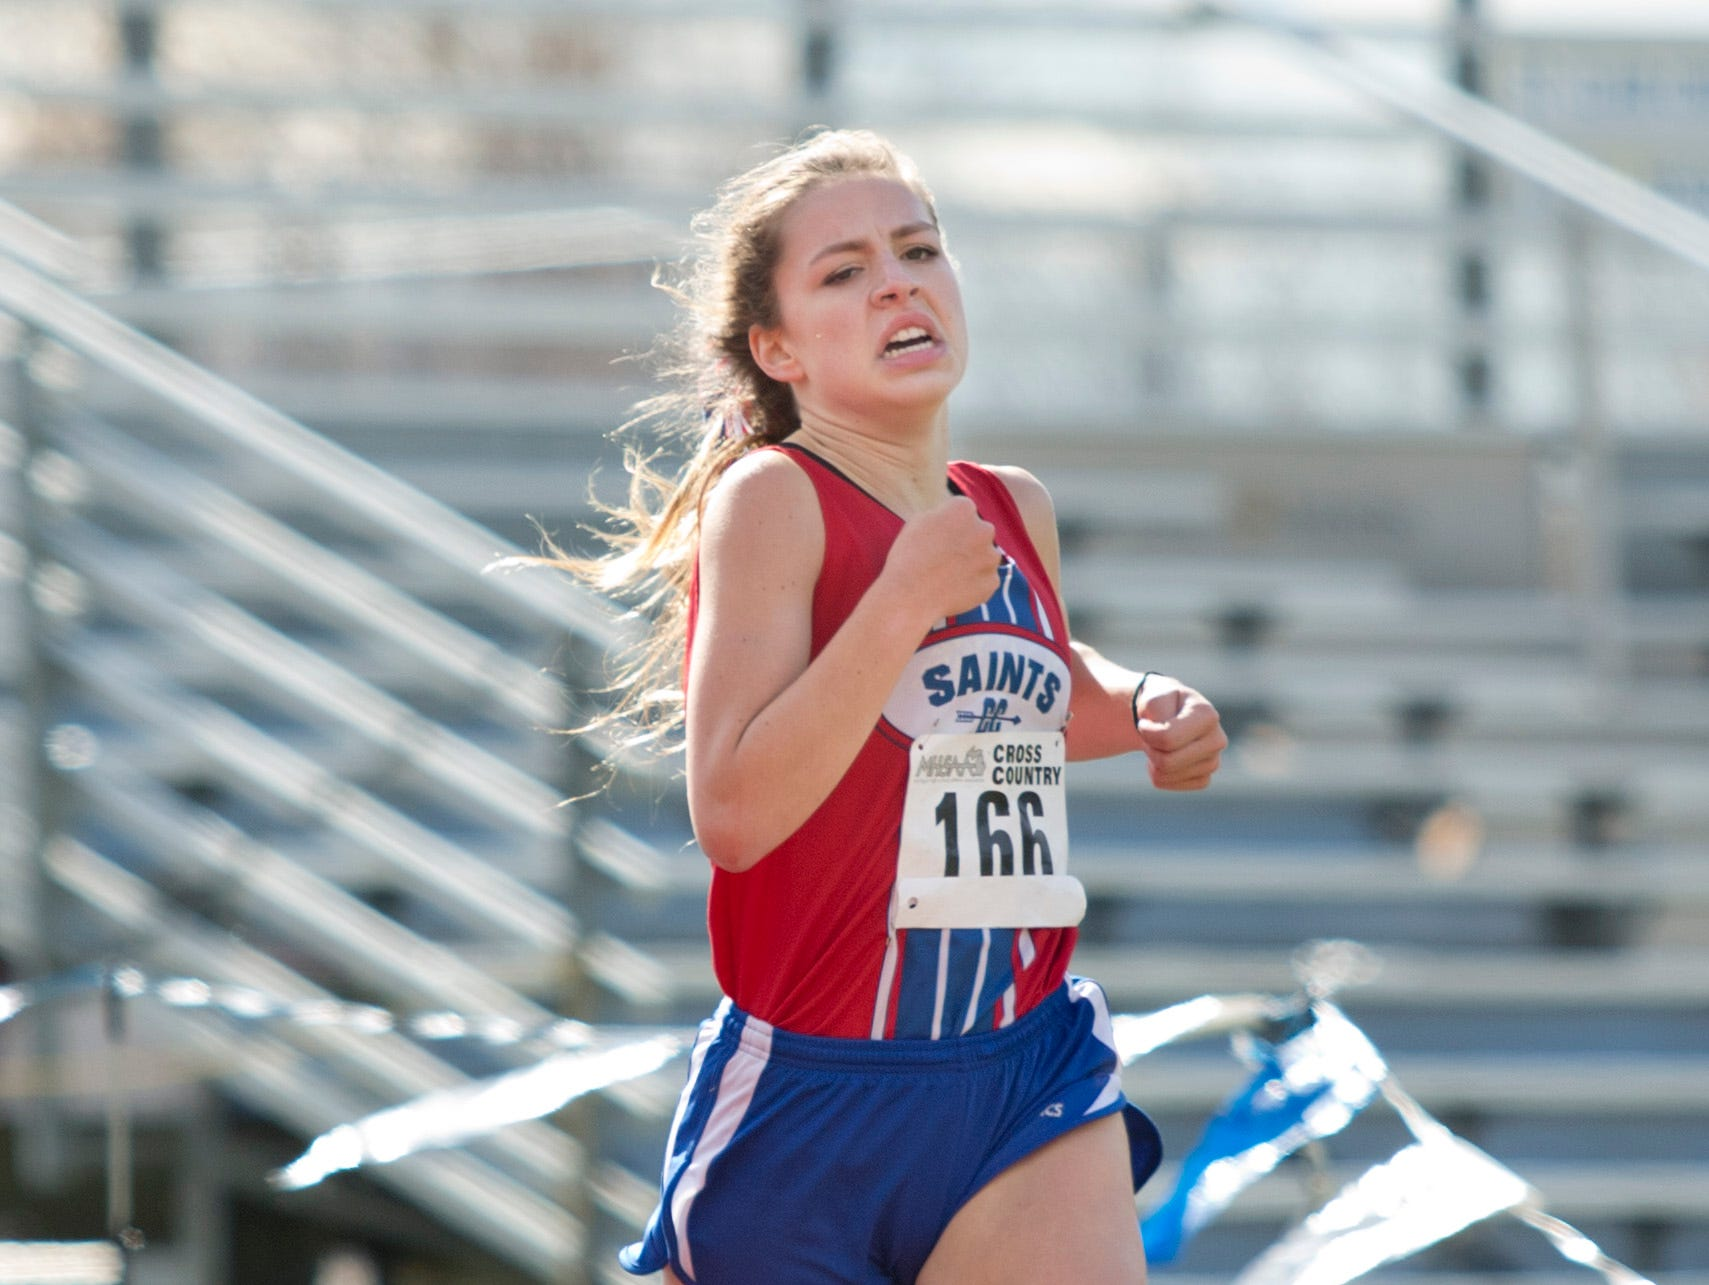 St. Clair's Gabrielle Morton runs during a regional cross county meet Friday, October 30, 2015 at Algonac High School.